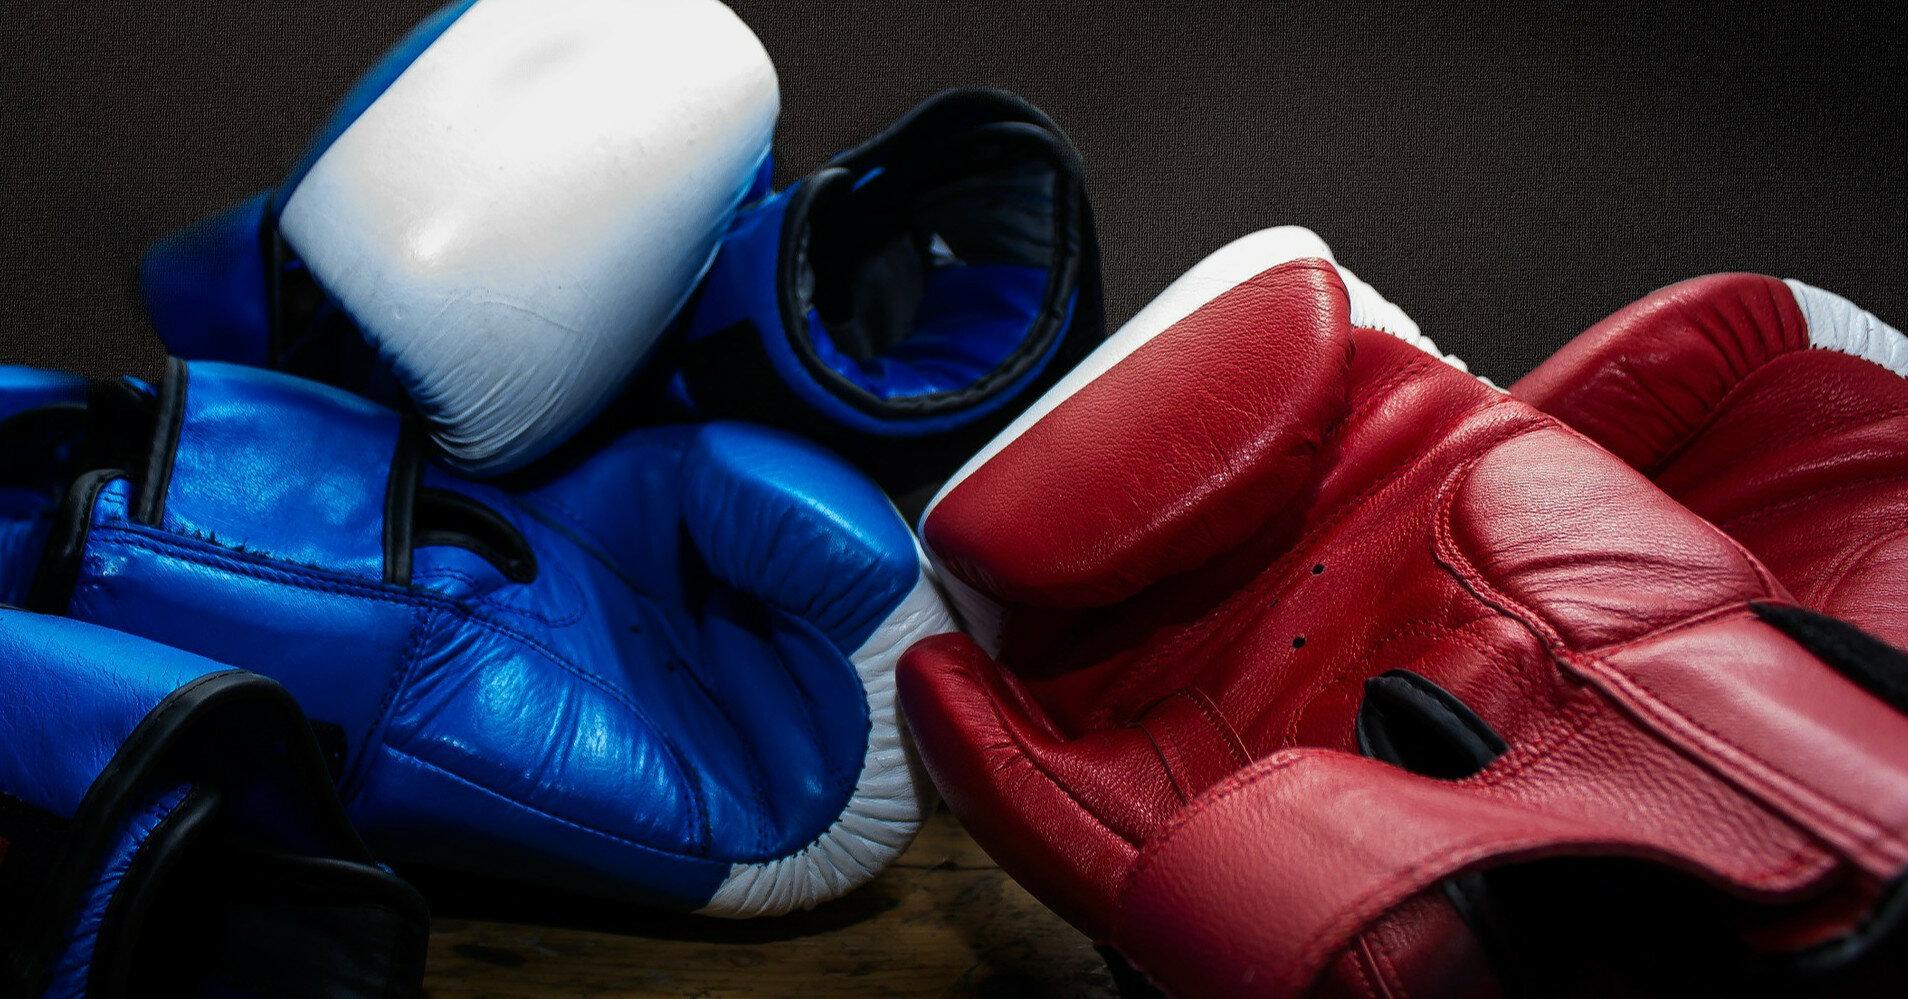 Непобедимый боксер дал прогноз на бой Усик - Джошуа